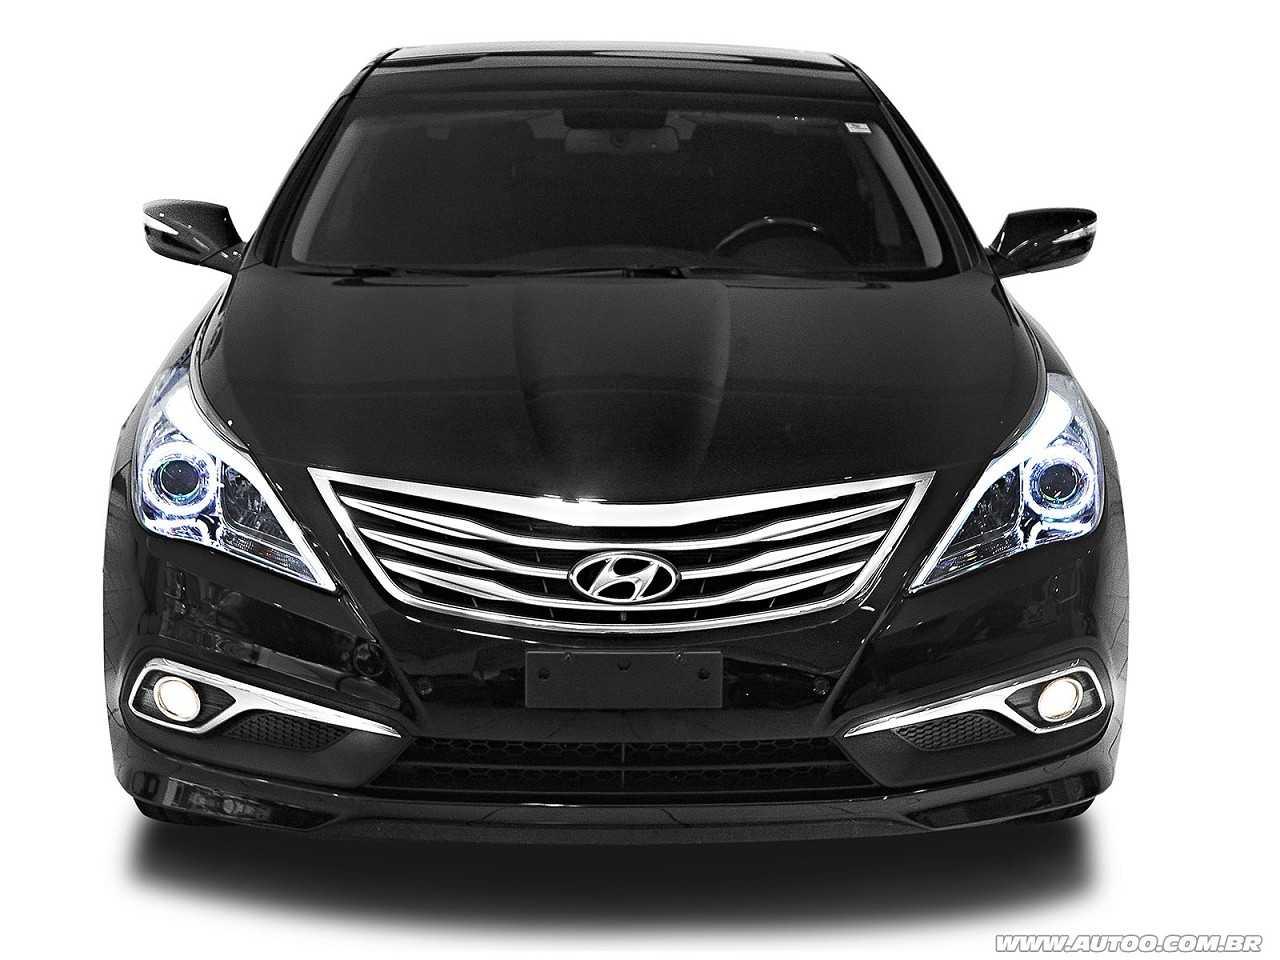 HyundaiAzera 2015 - frente